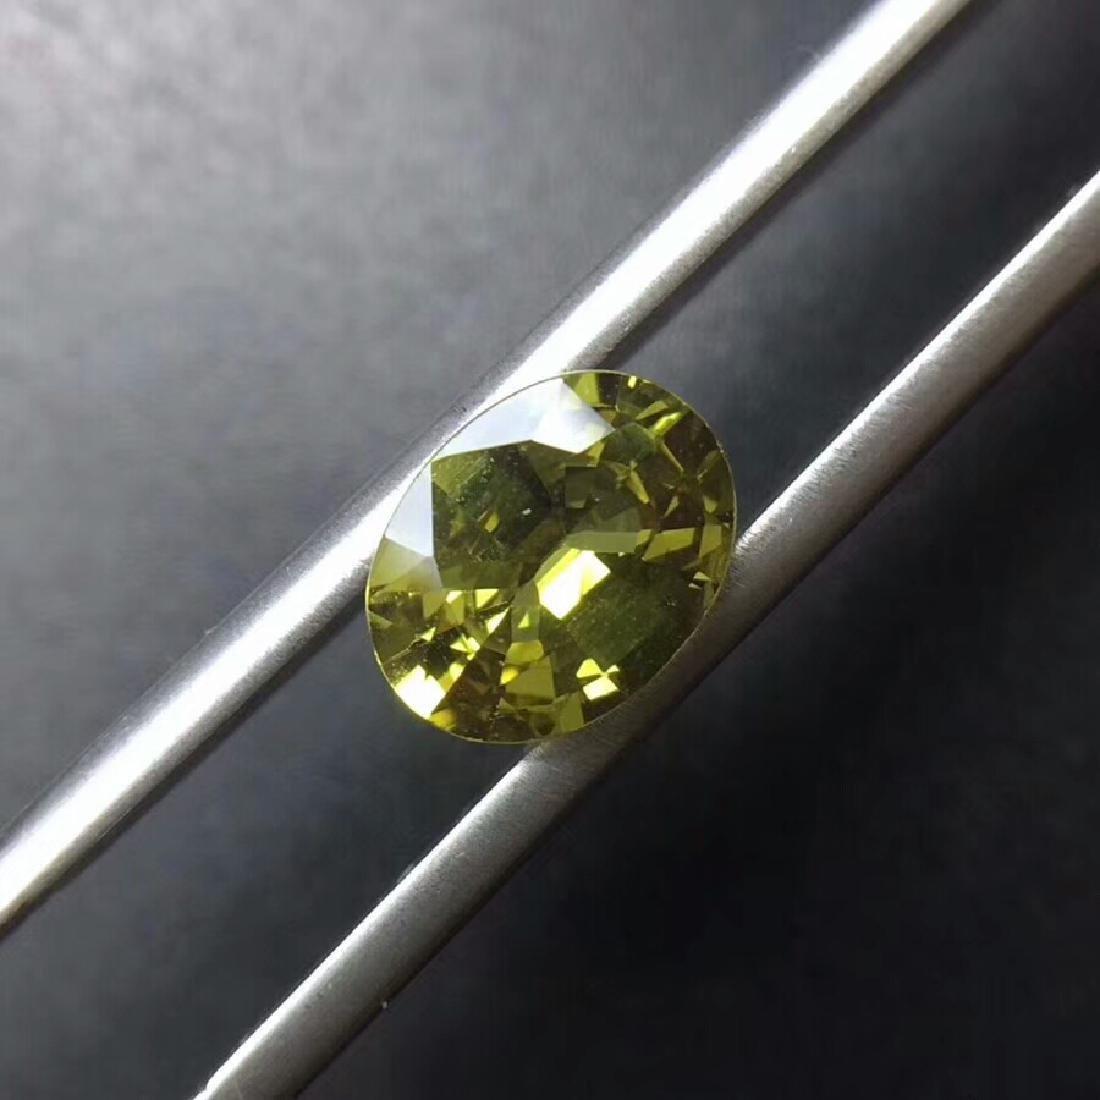 1.75 ct Chrysoberyl 8.8*6.7*4.0 mm Oval Cut - 3